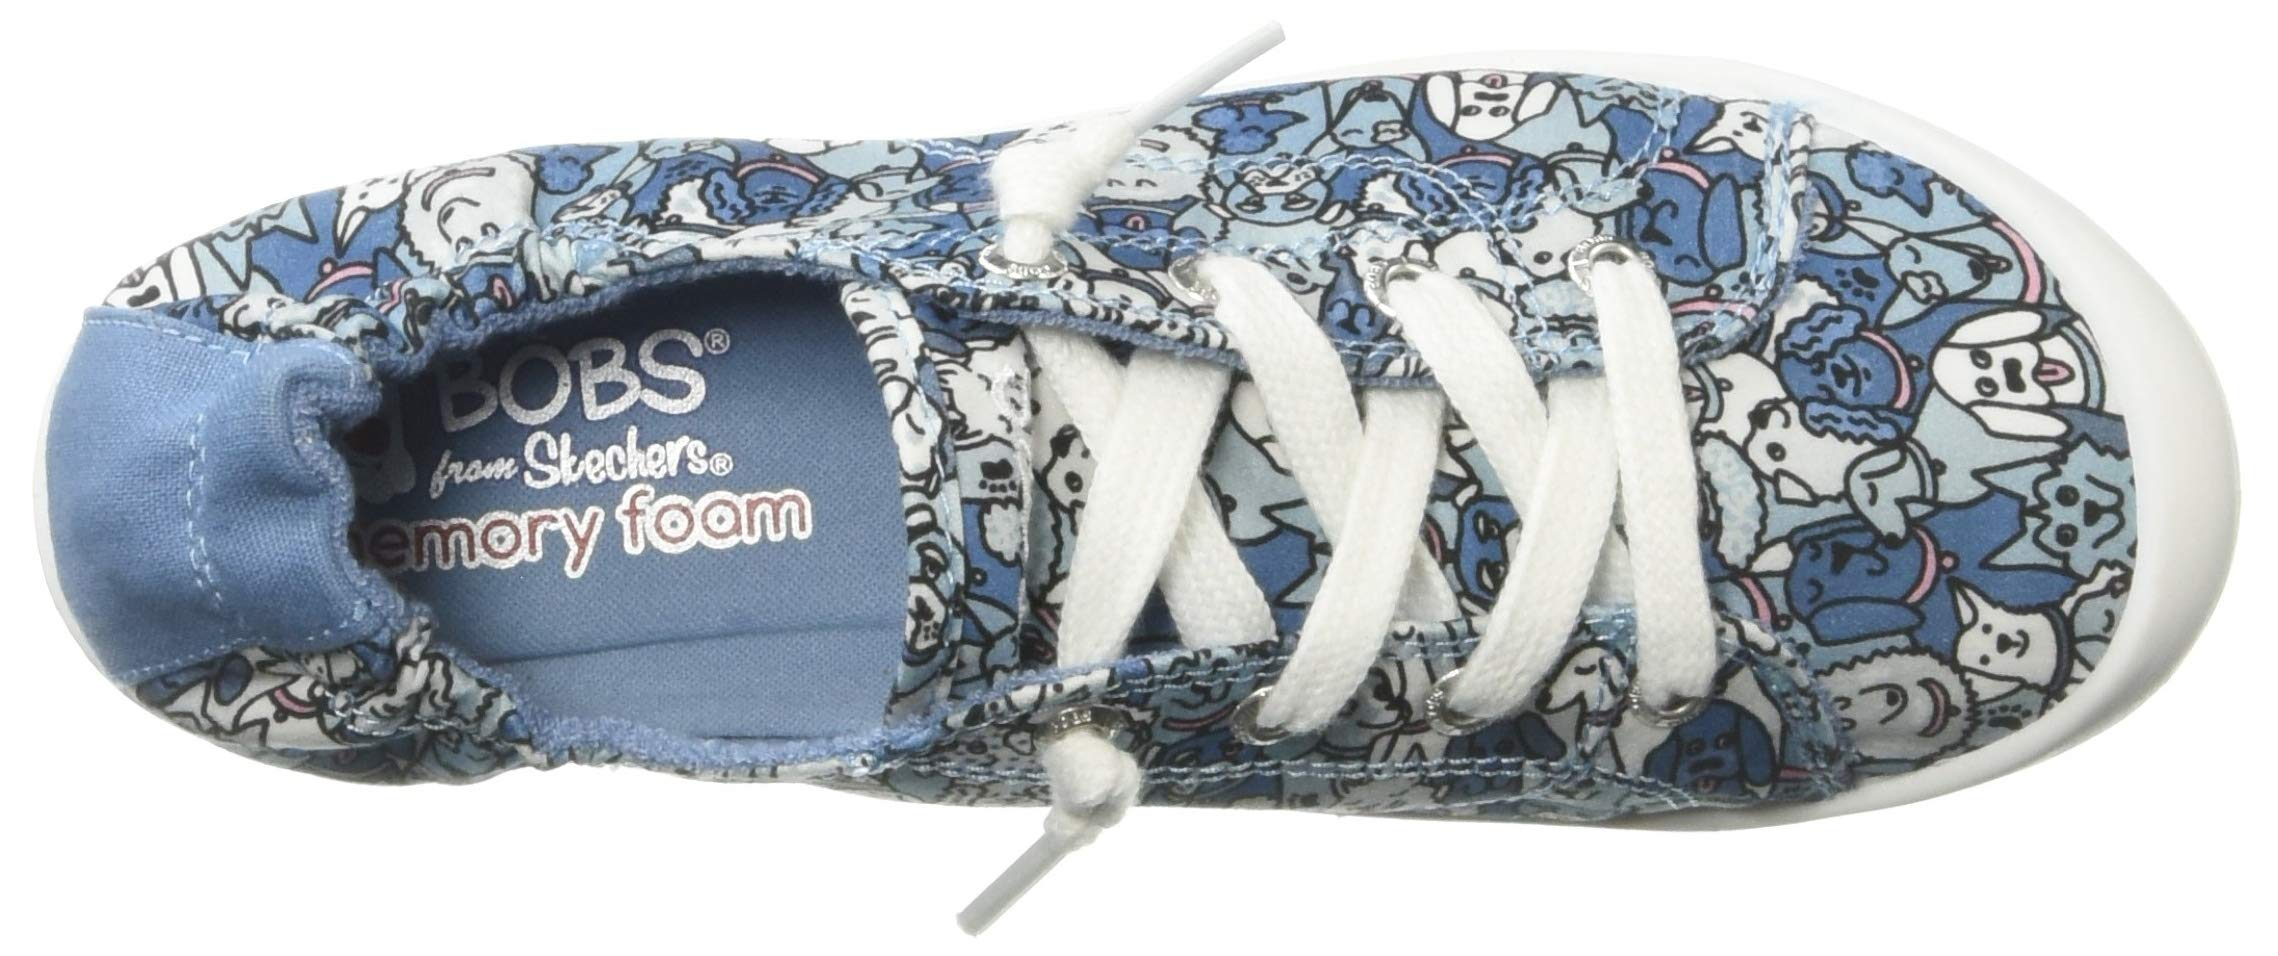 Skechers BOBS Women's Beach Bingo-Woof Pack Platform, Blue Multi, 8 M US